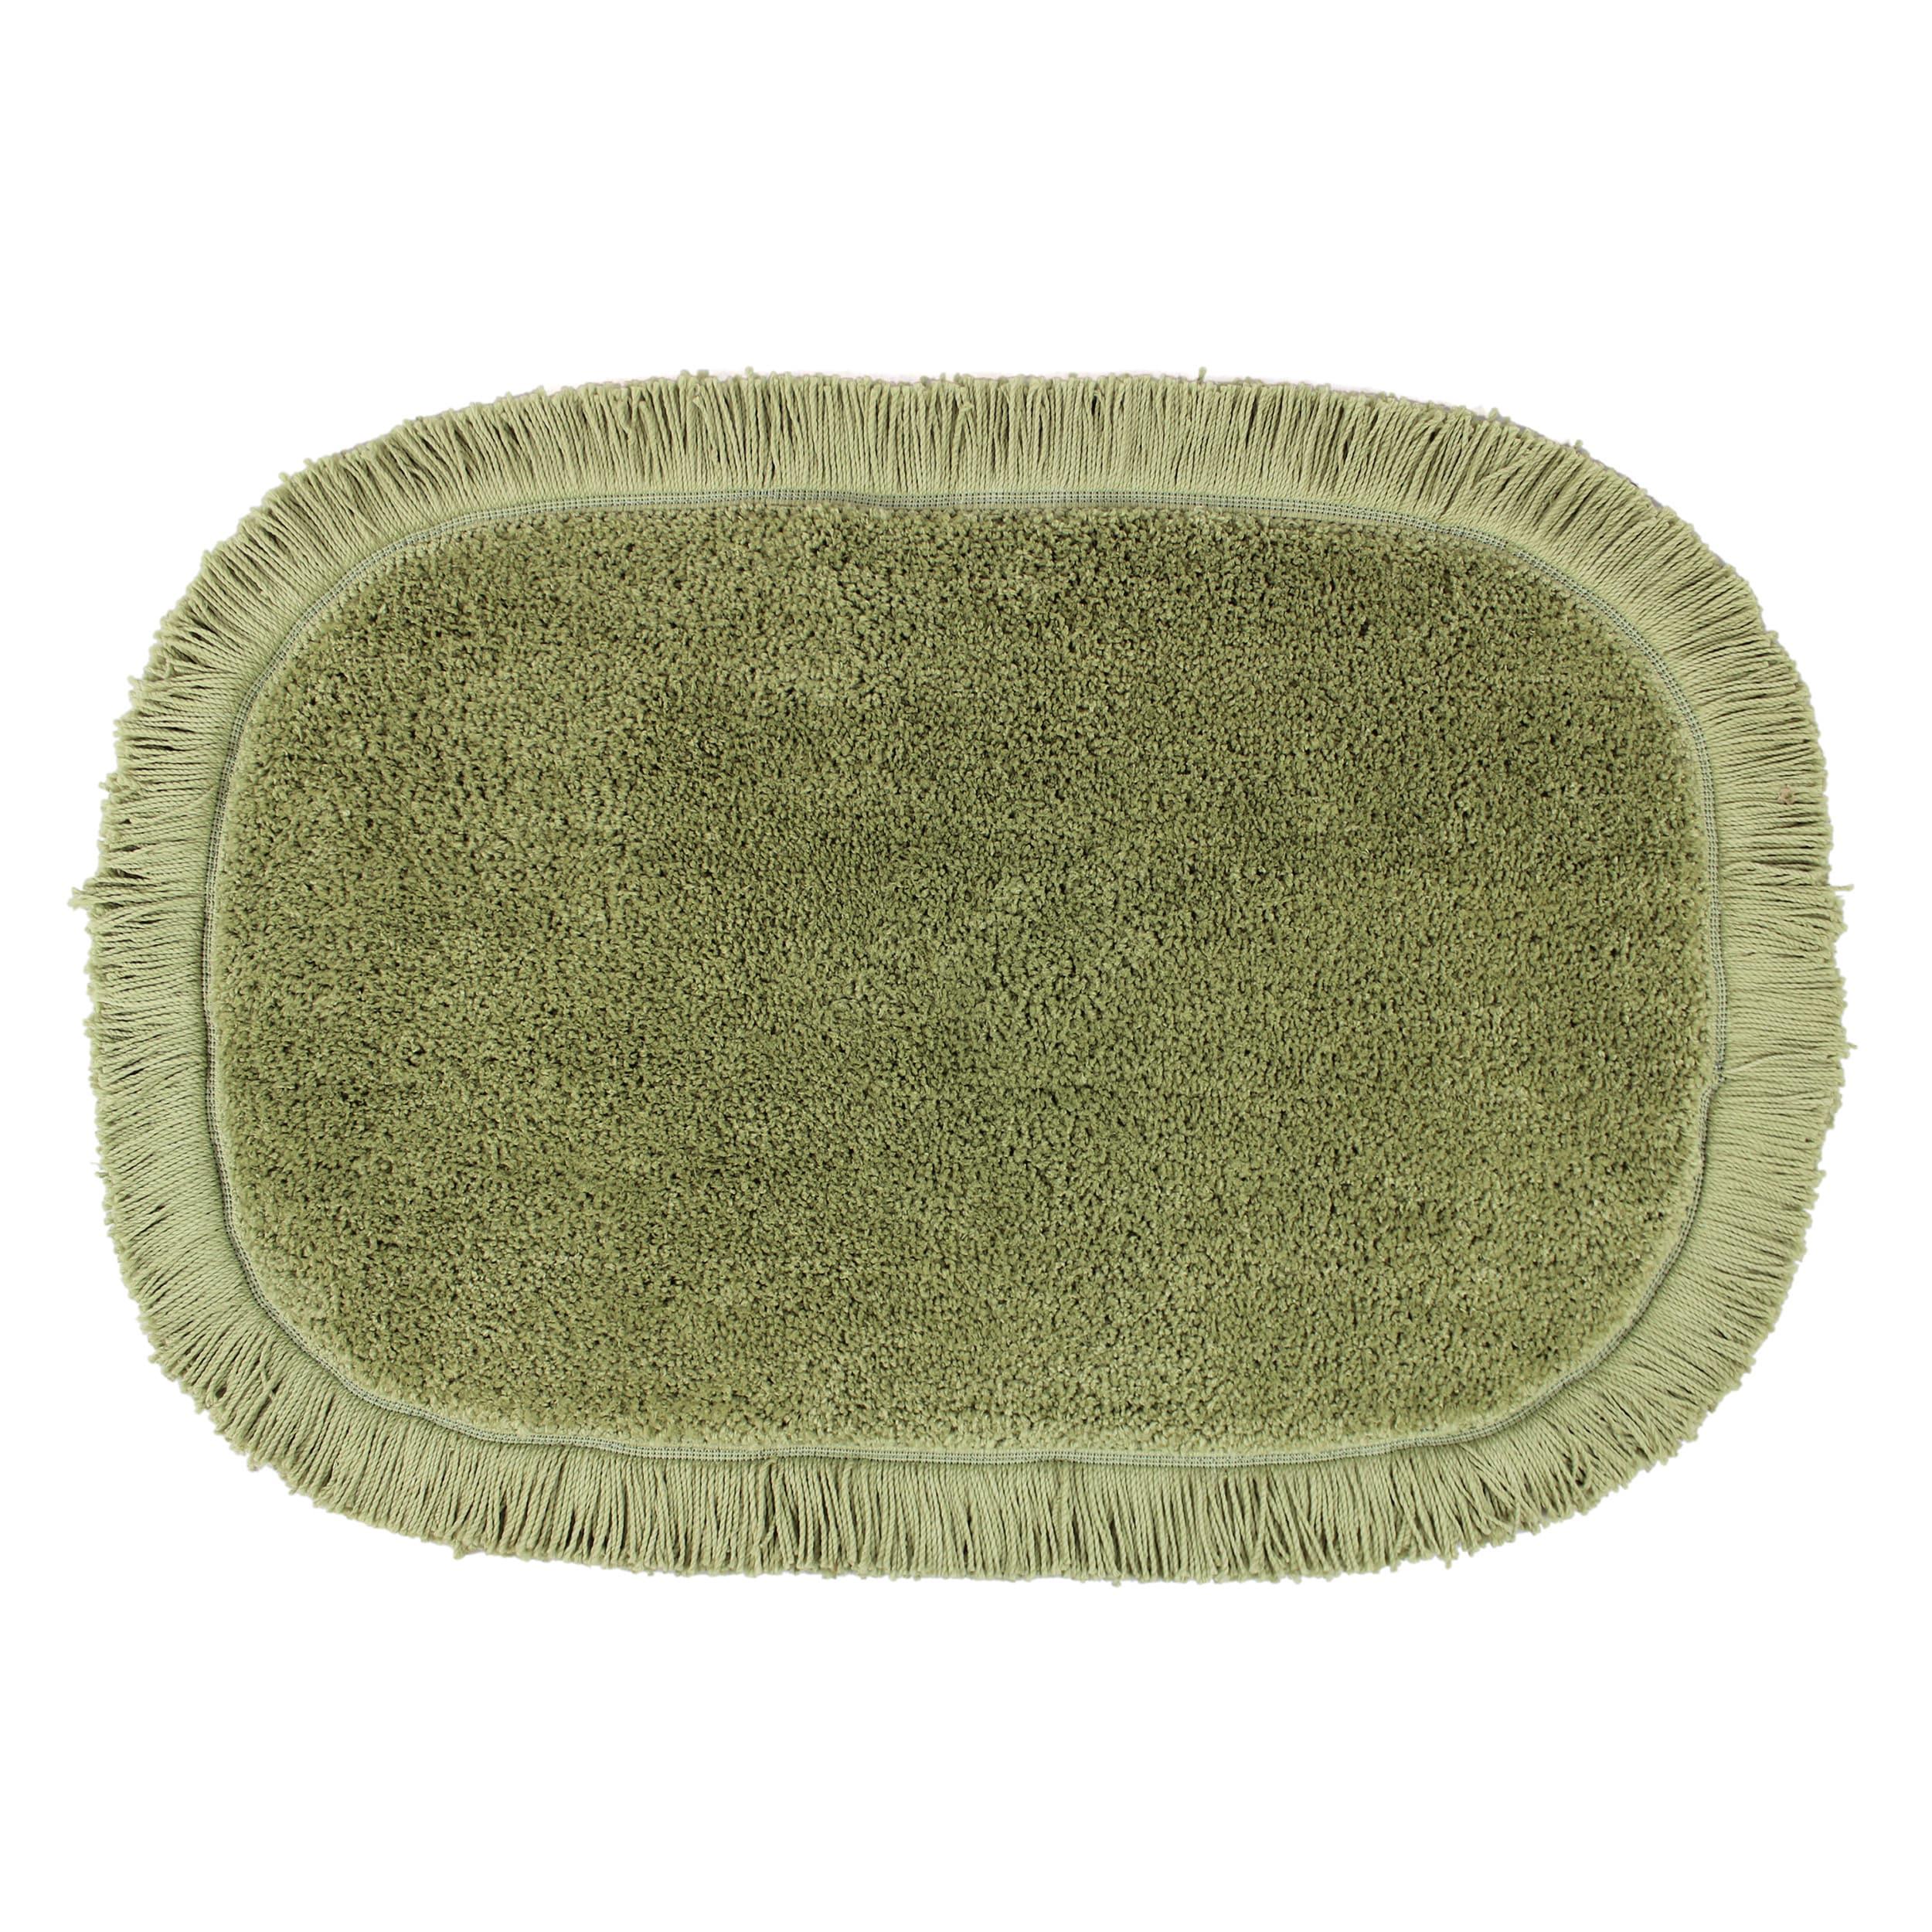 Sherry Kline Sage Green Fringed 20 X 30